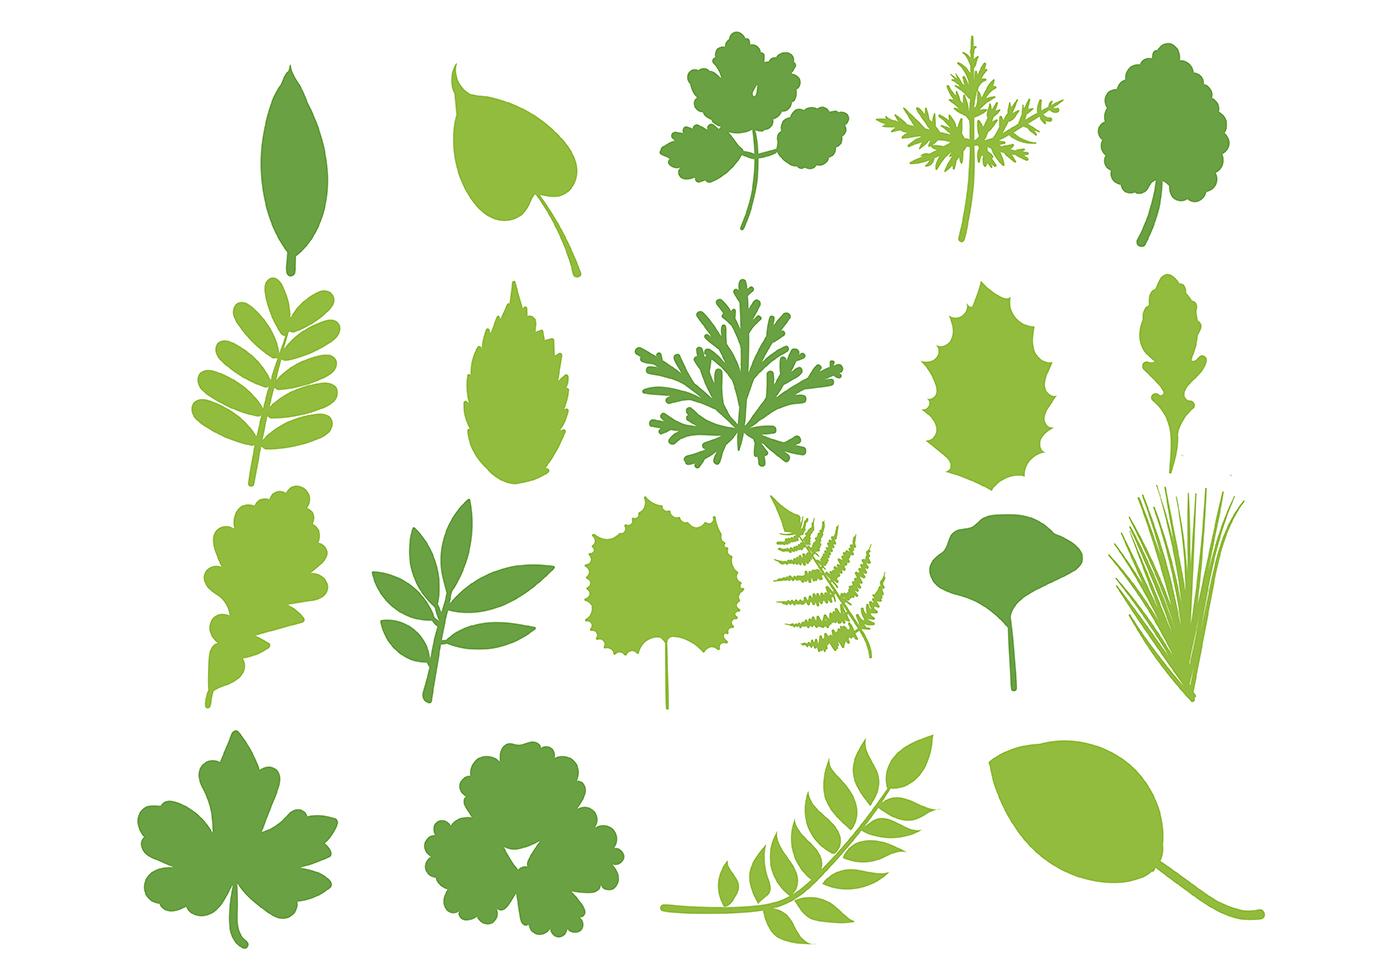 leaf free vector art 22237 free downloads rh vecteezy com vector leasing vector leather